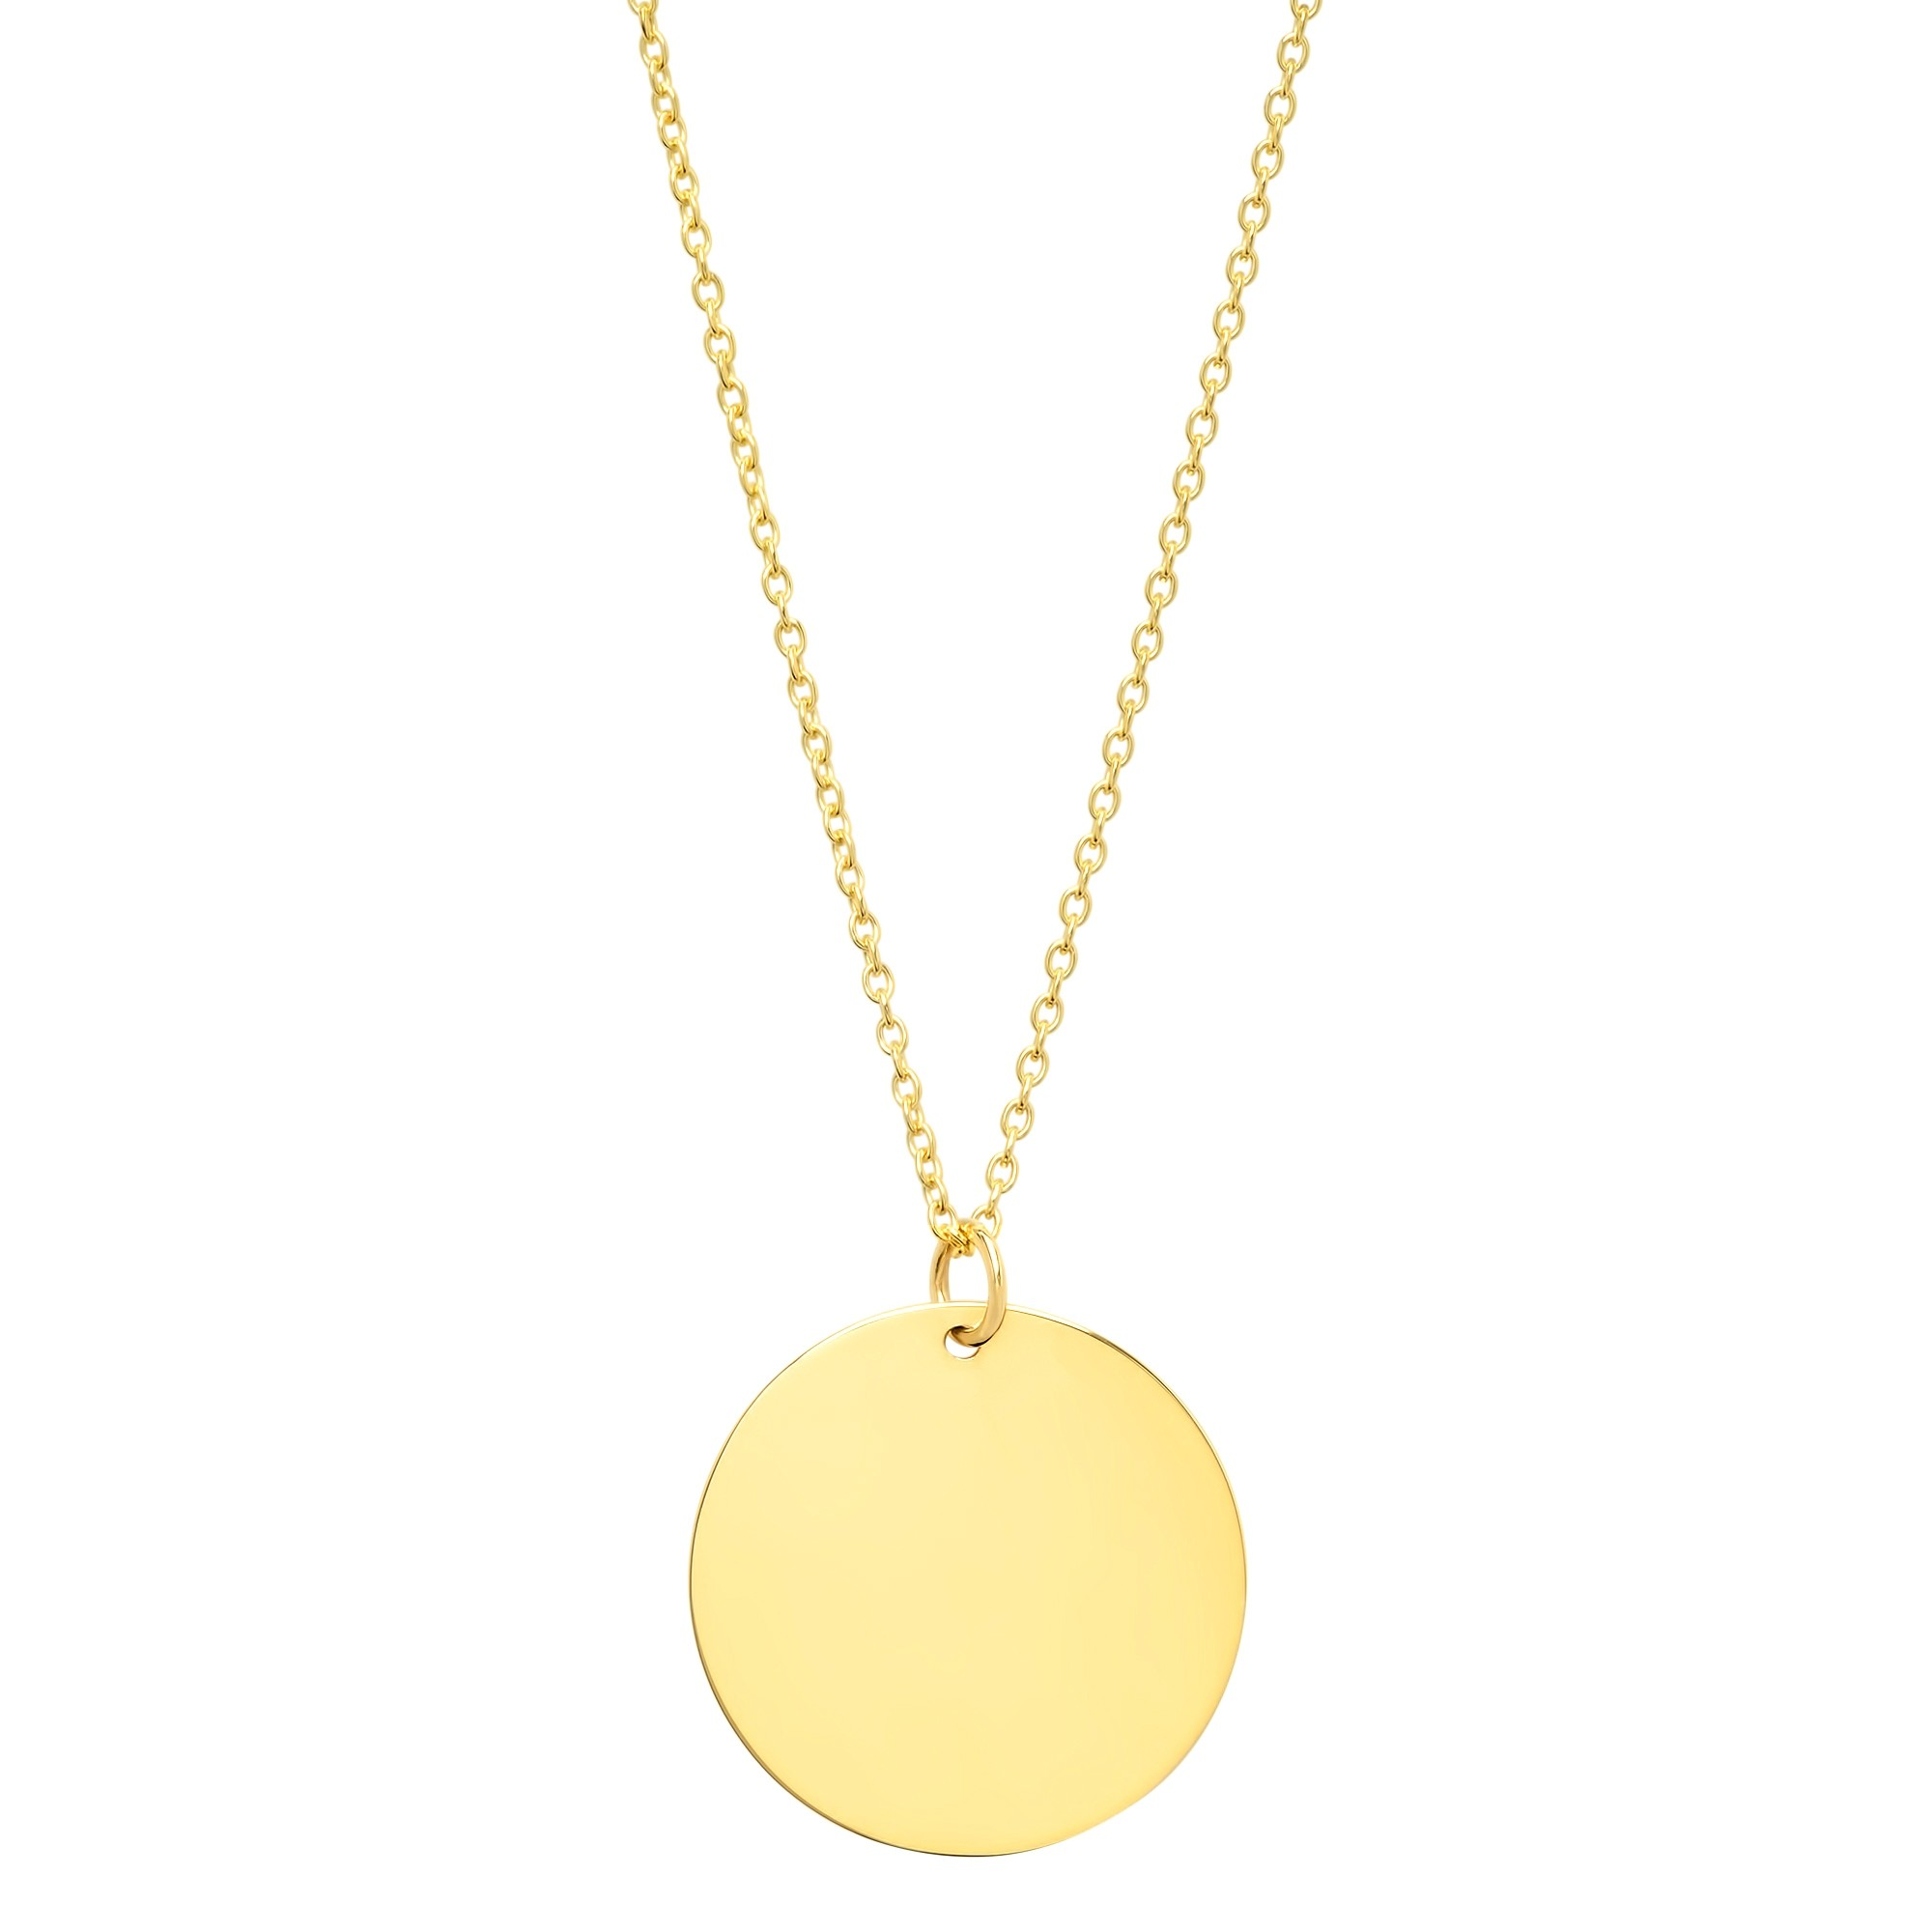 14k Yellow Gold Medium Disc Necklace